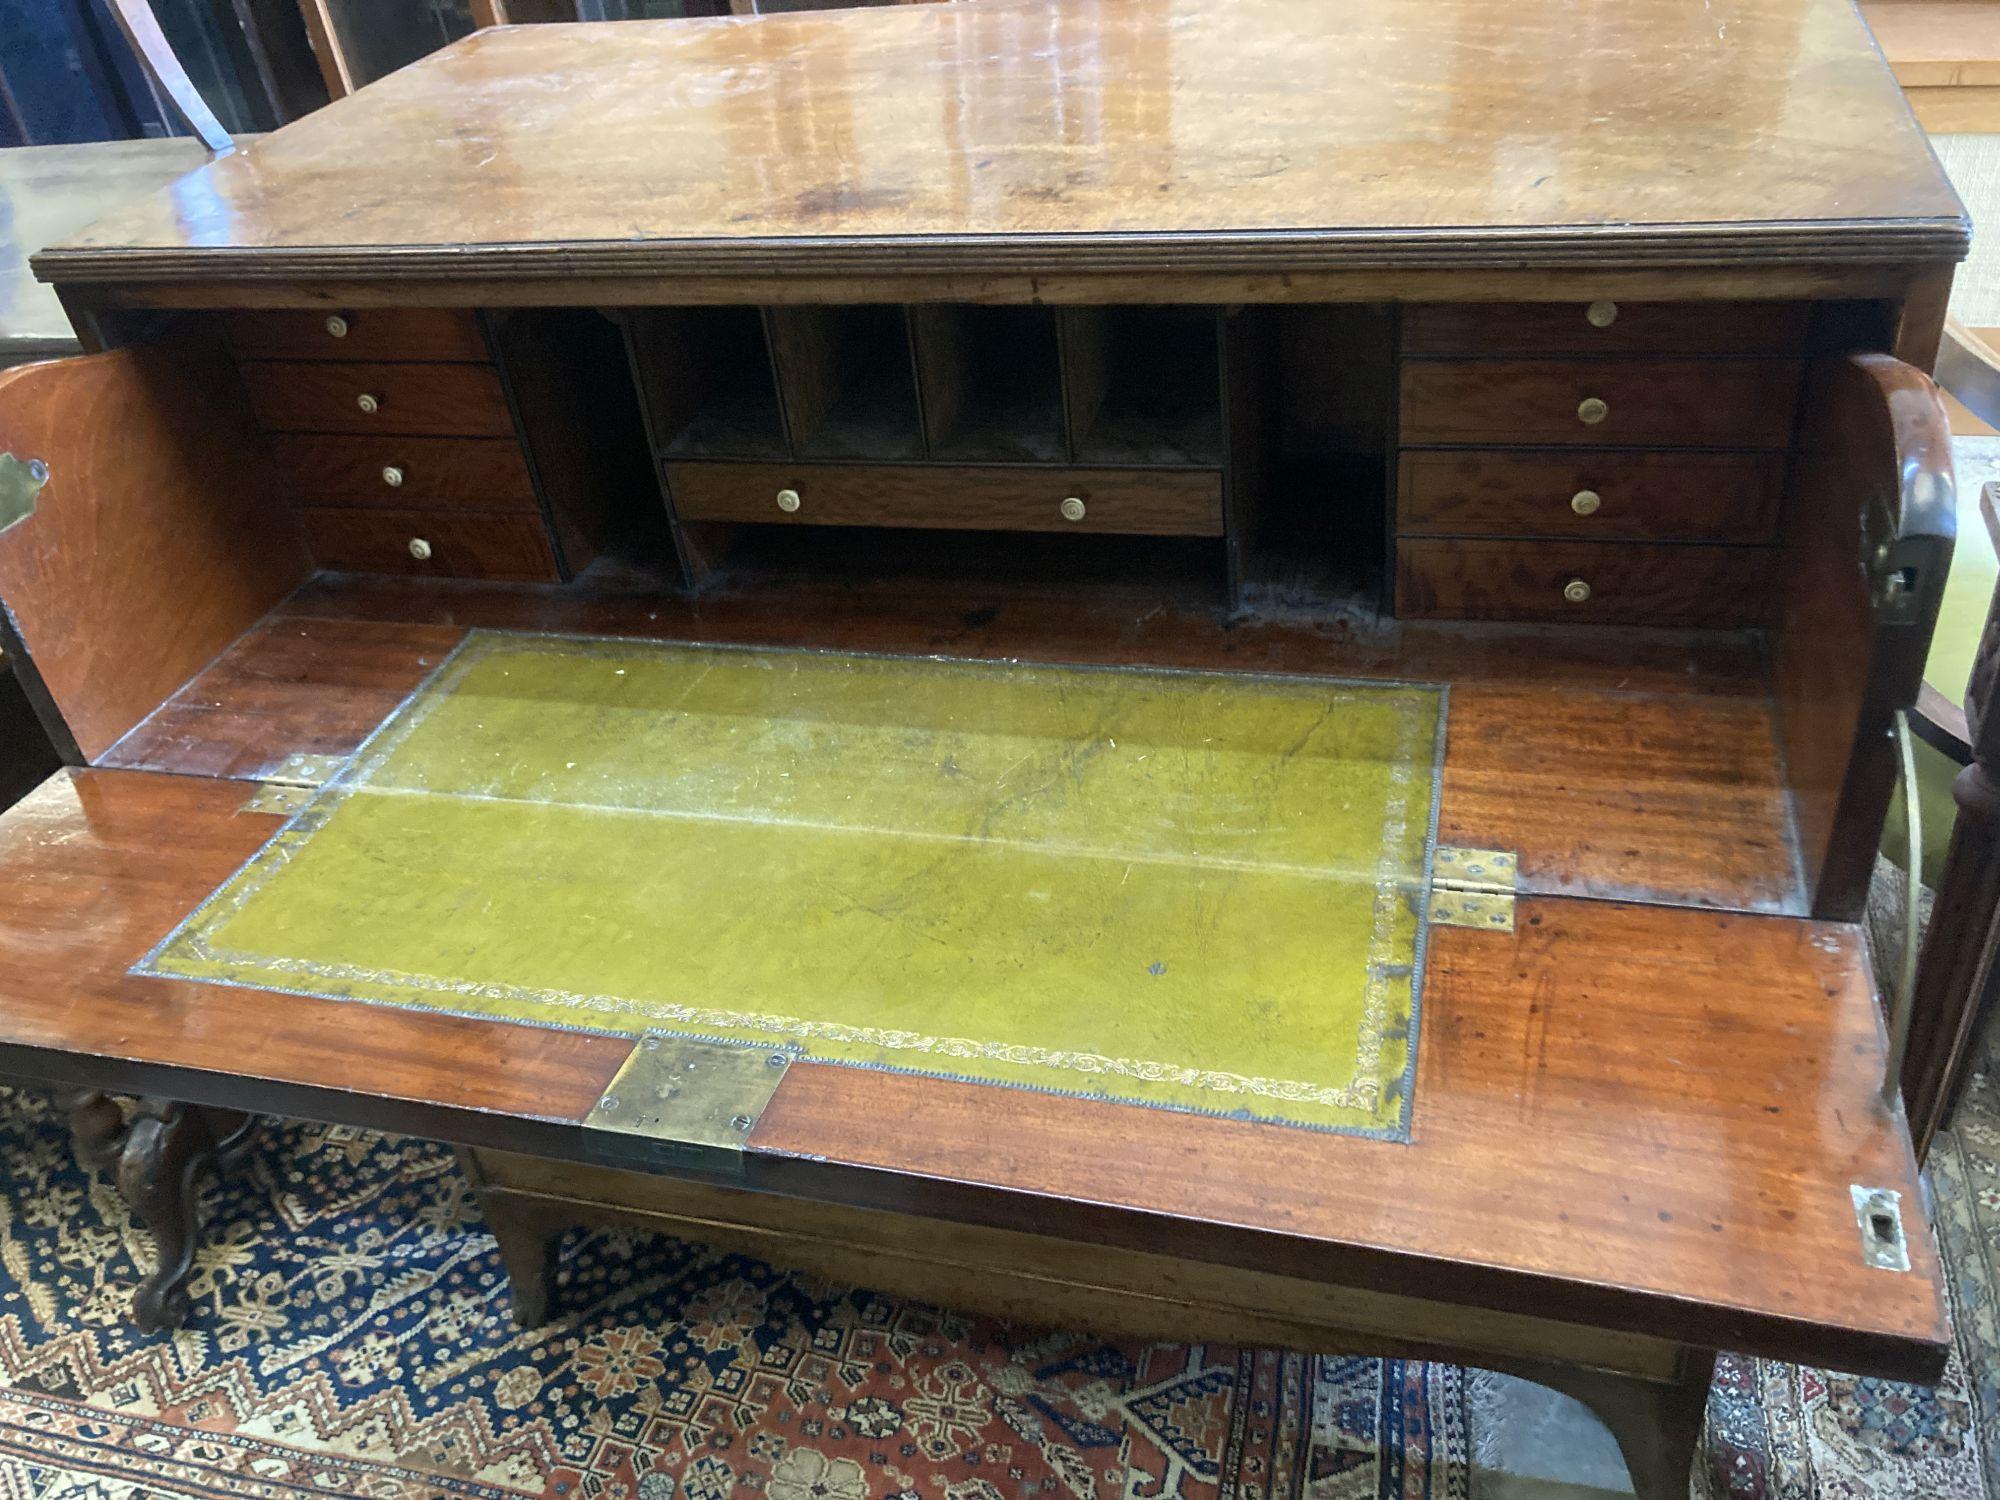 A Regency mahogany secretaire chest, width 106cm depth 55cm height 106cm - Image 3 of 4